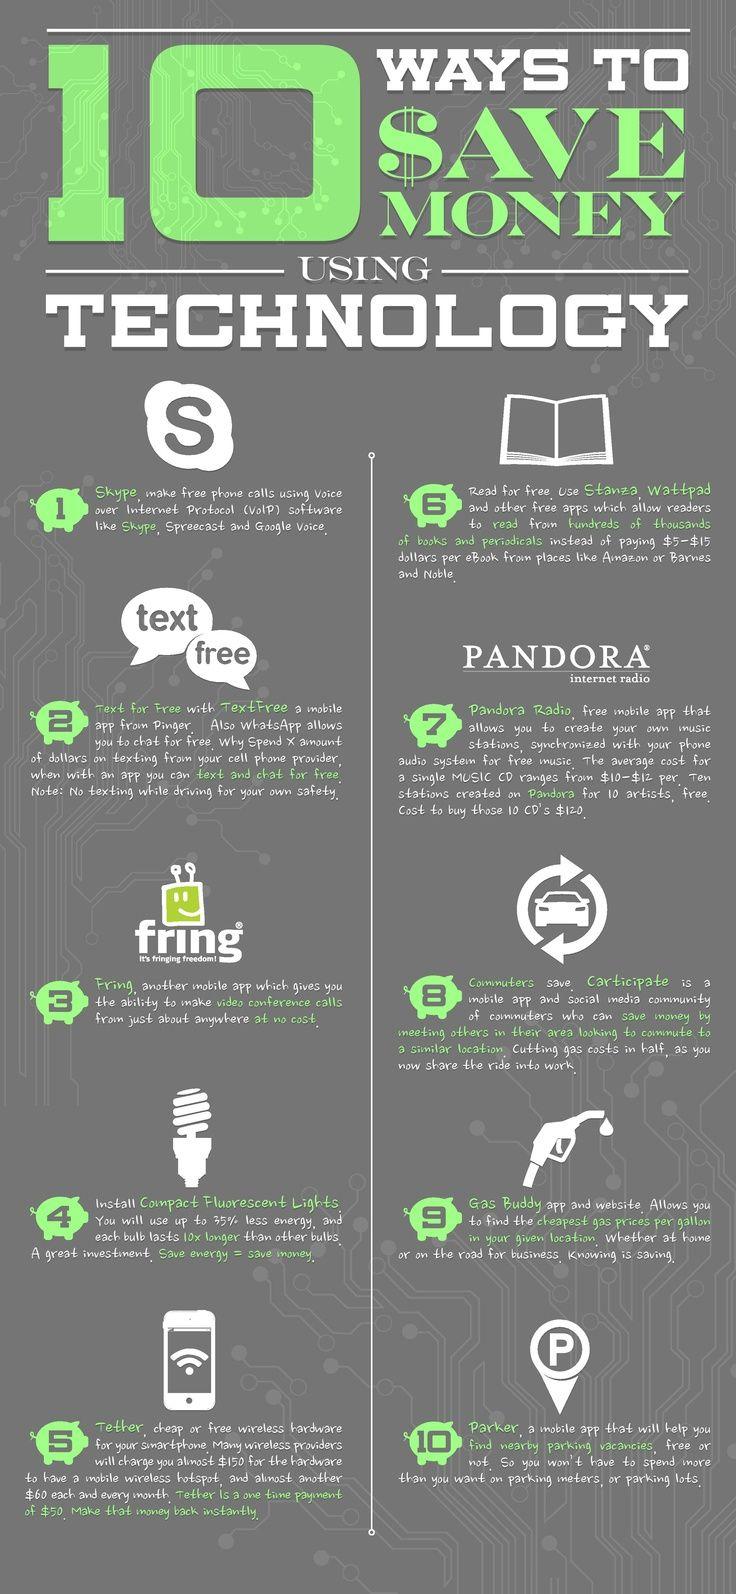 10 Ways to Save Money Using Technology